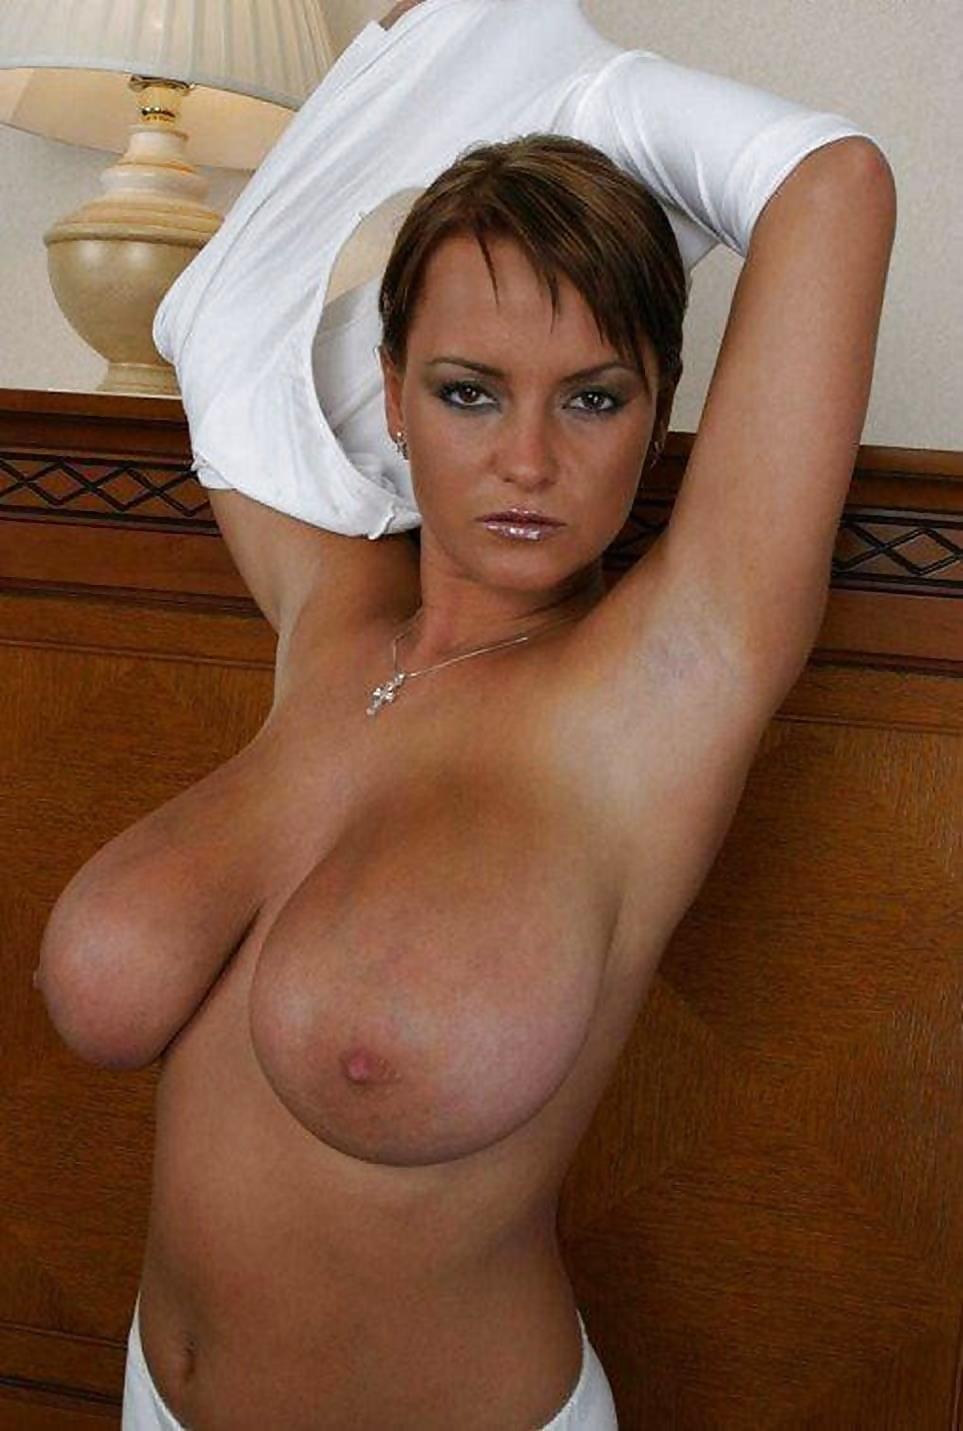 polish-big-tits-free-pics